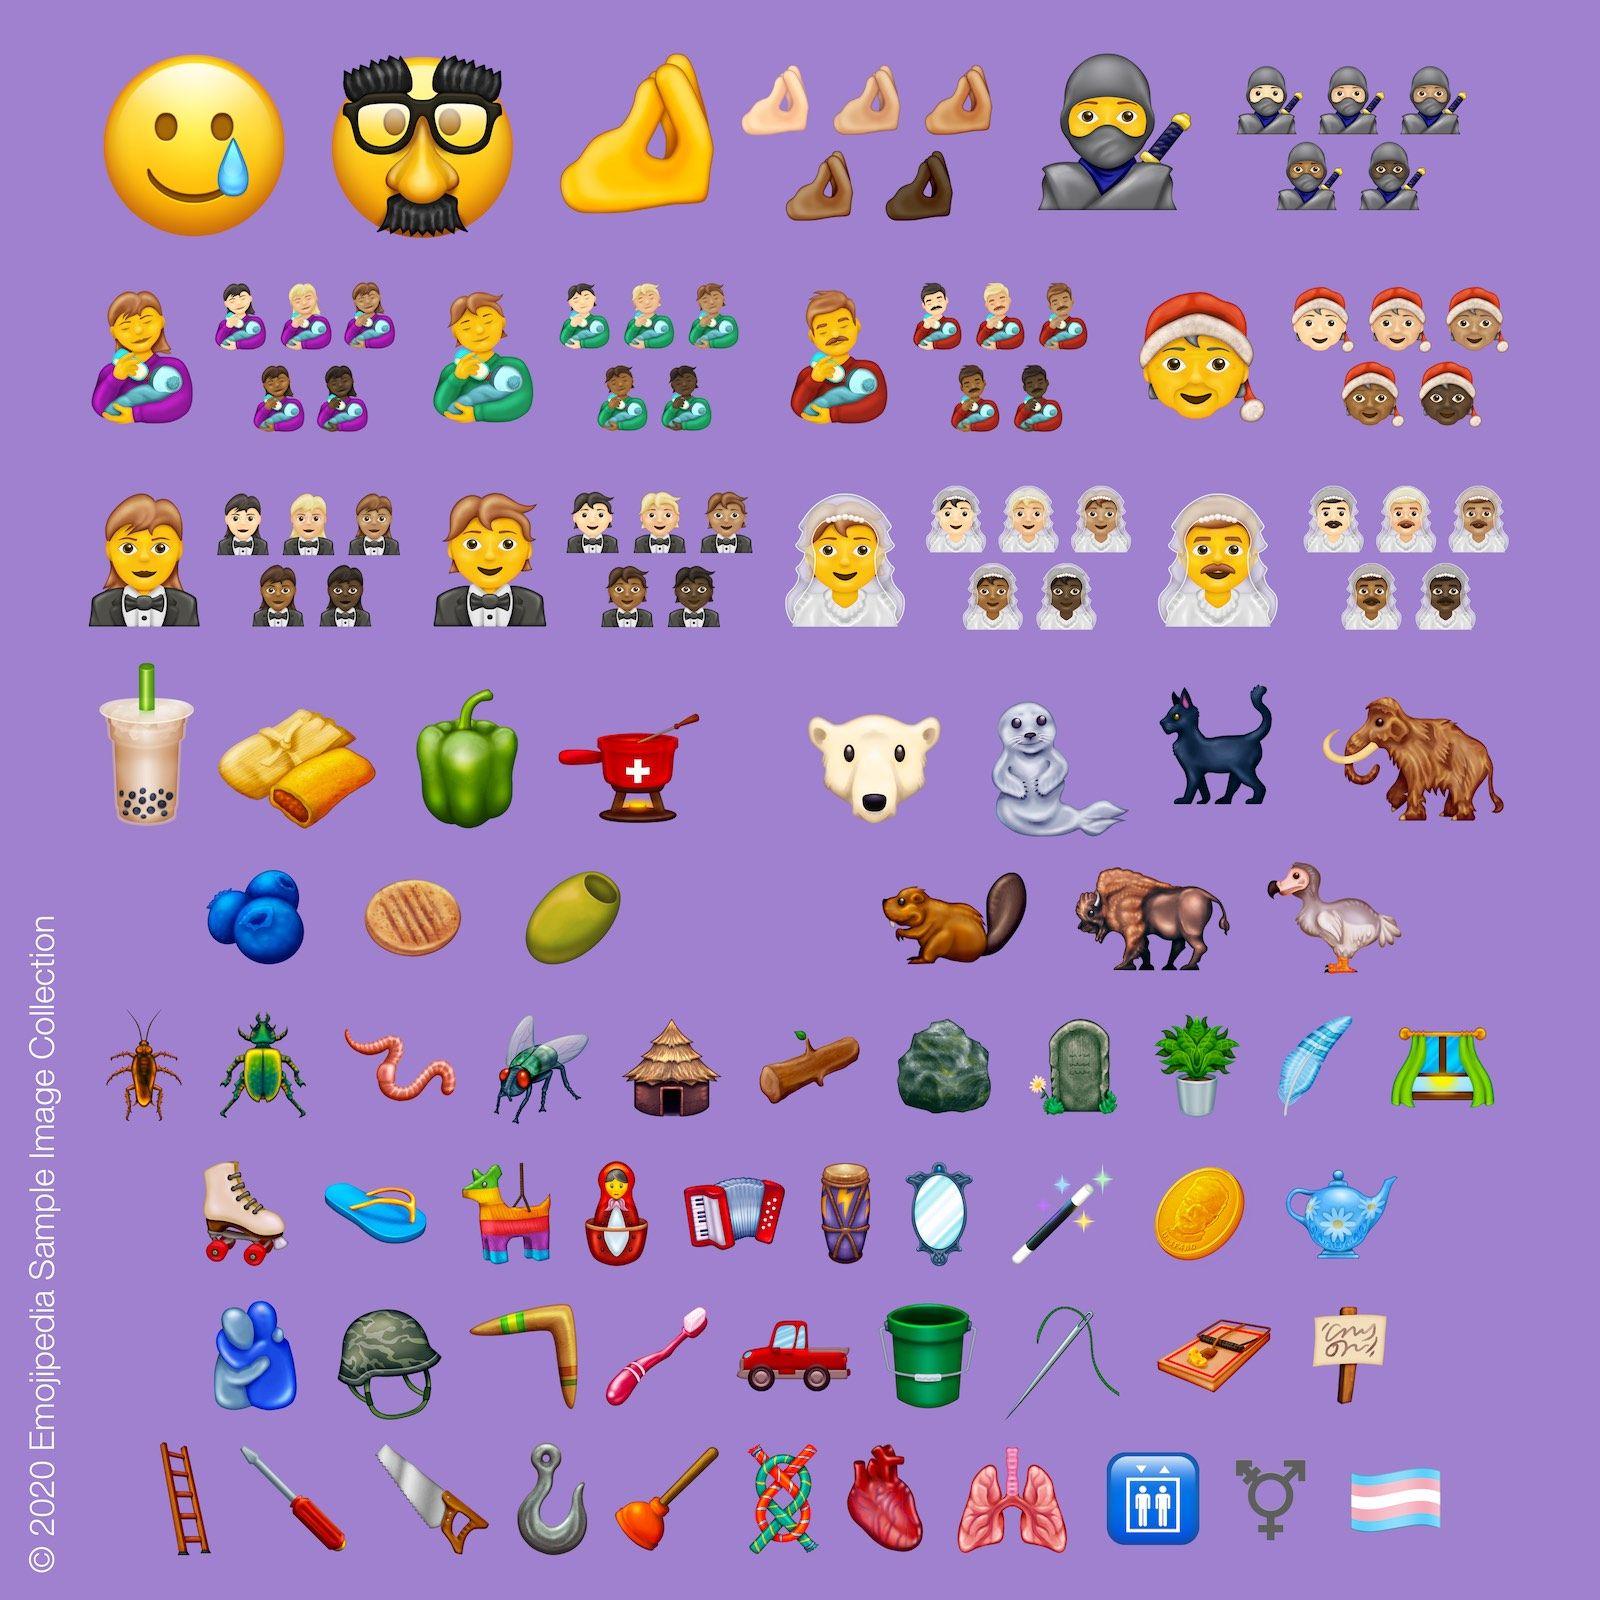 2020 new emoji iPhone iPad Mac more